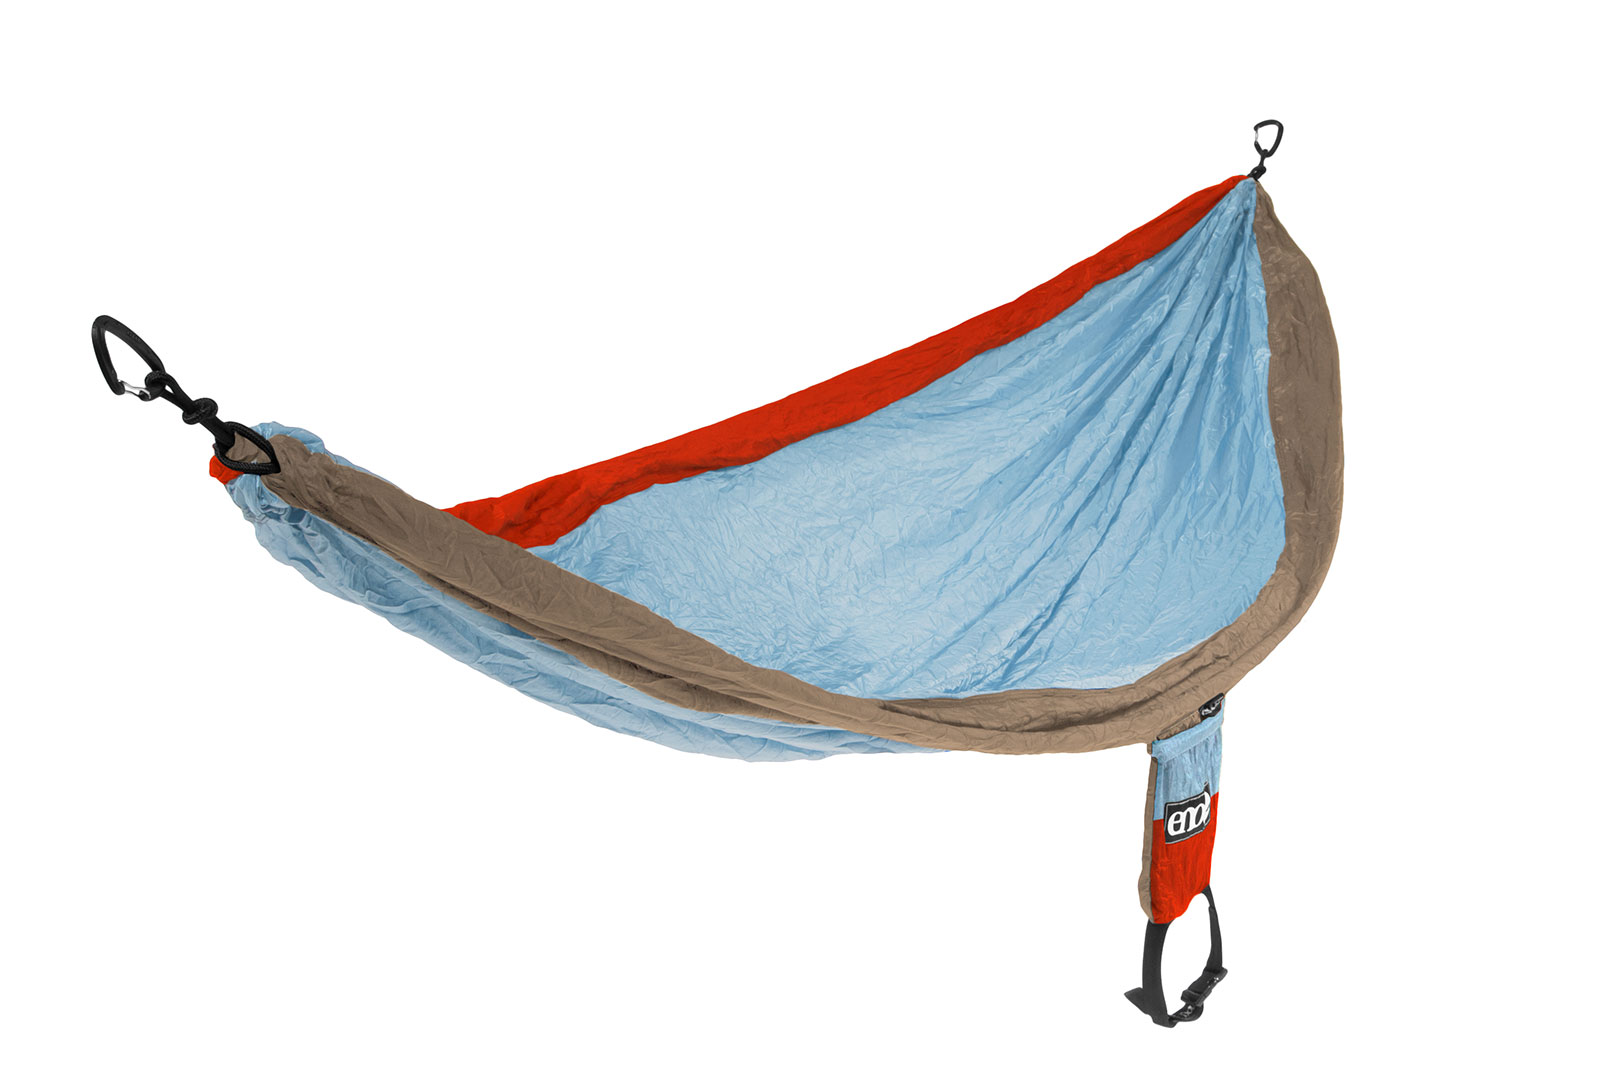 Eno Singlenest Hammock Outdoor Camping Backpacking Nylon